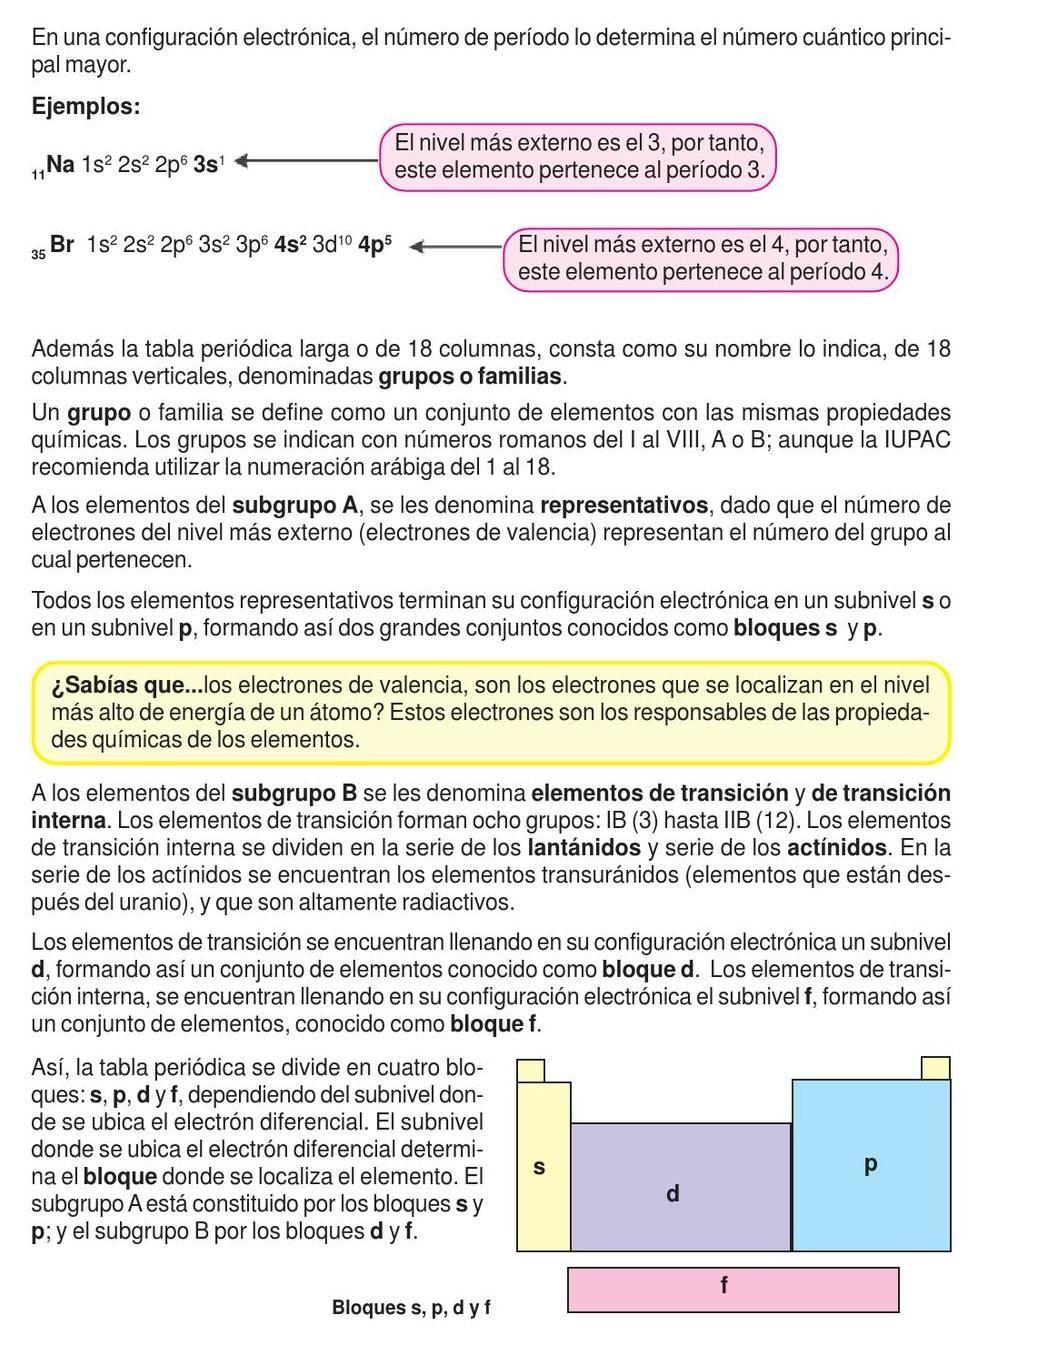 Libro de quimica clippedonissuu from libro de quimica urtaz Gallery